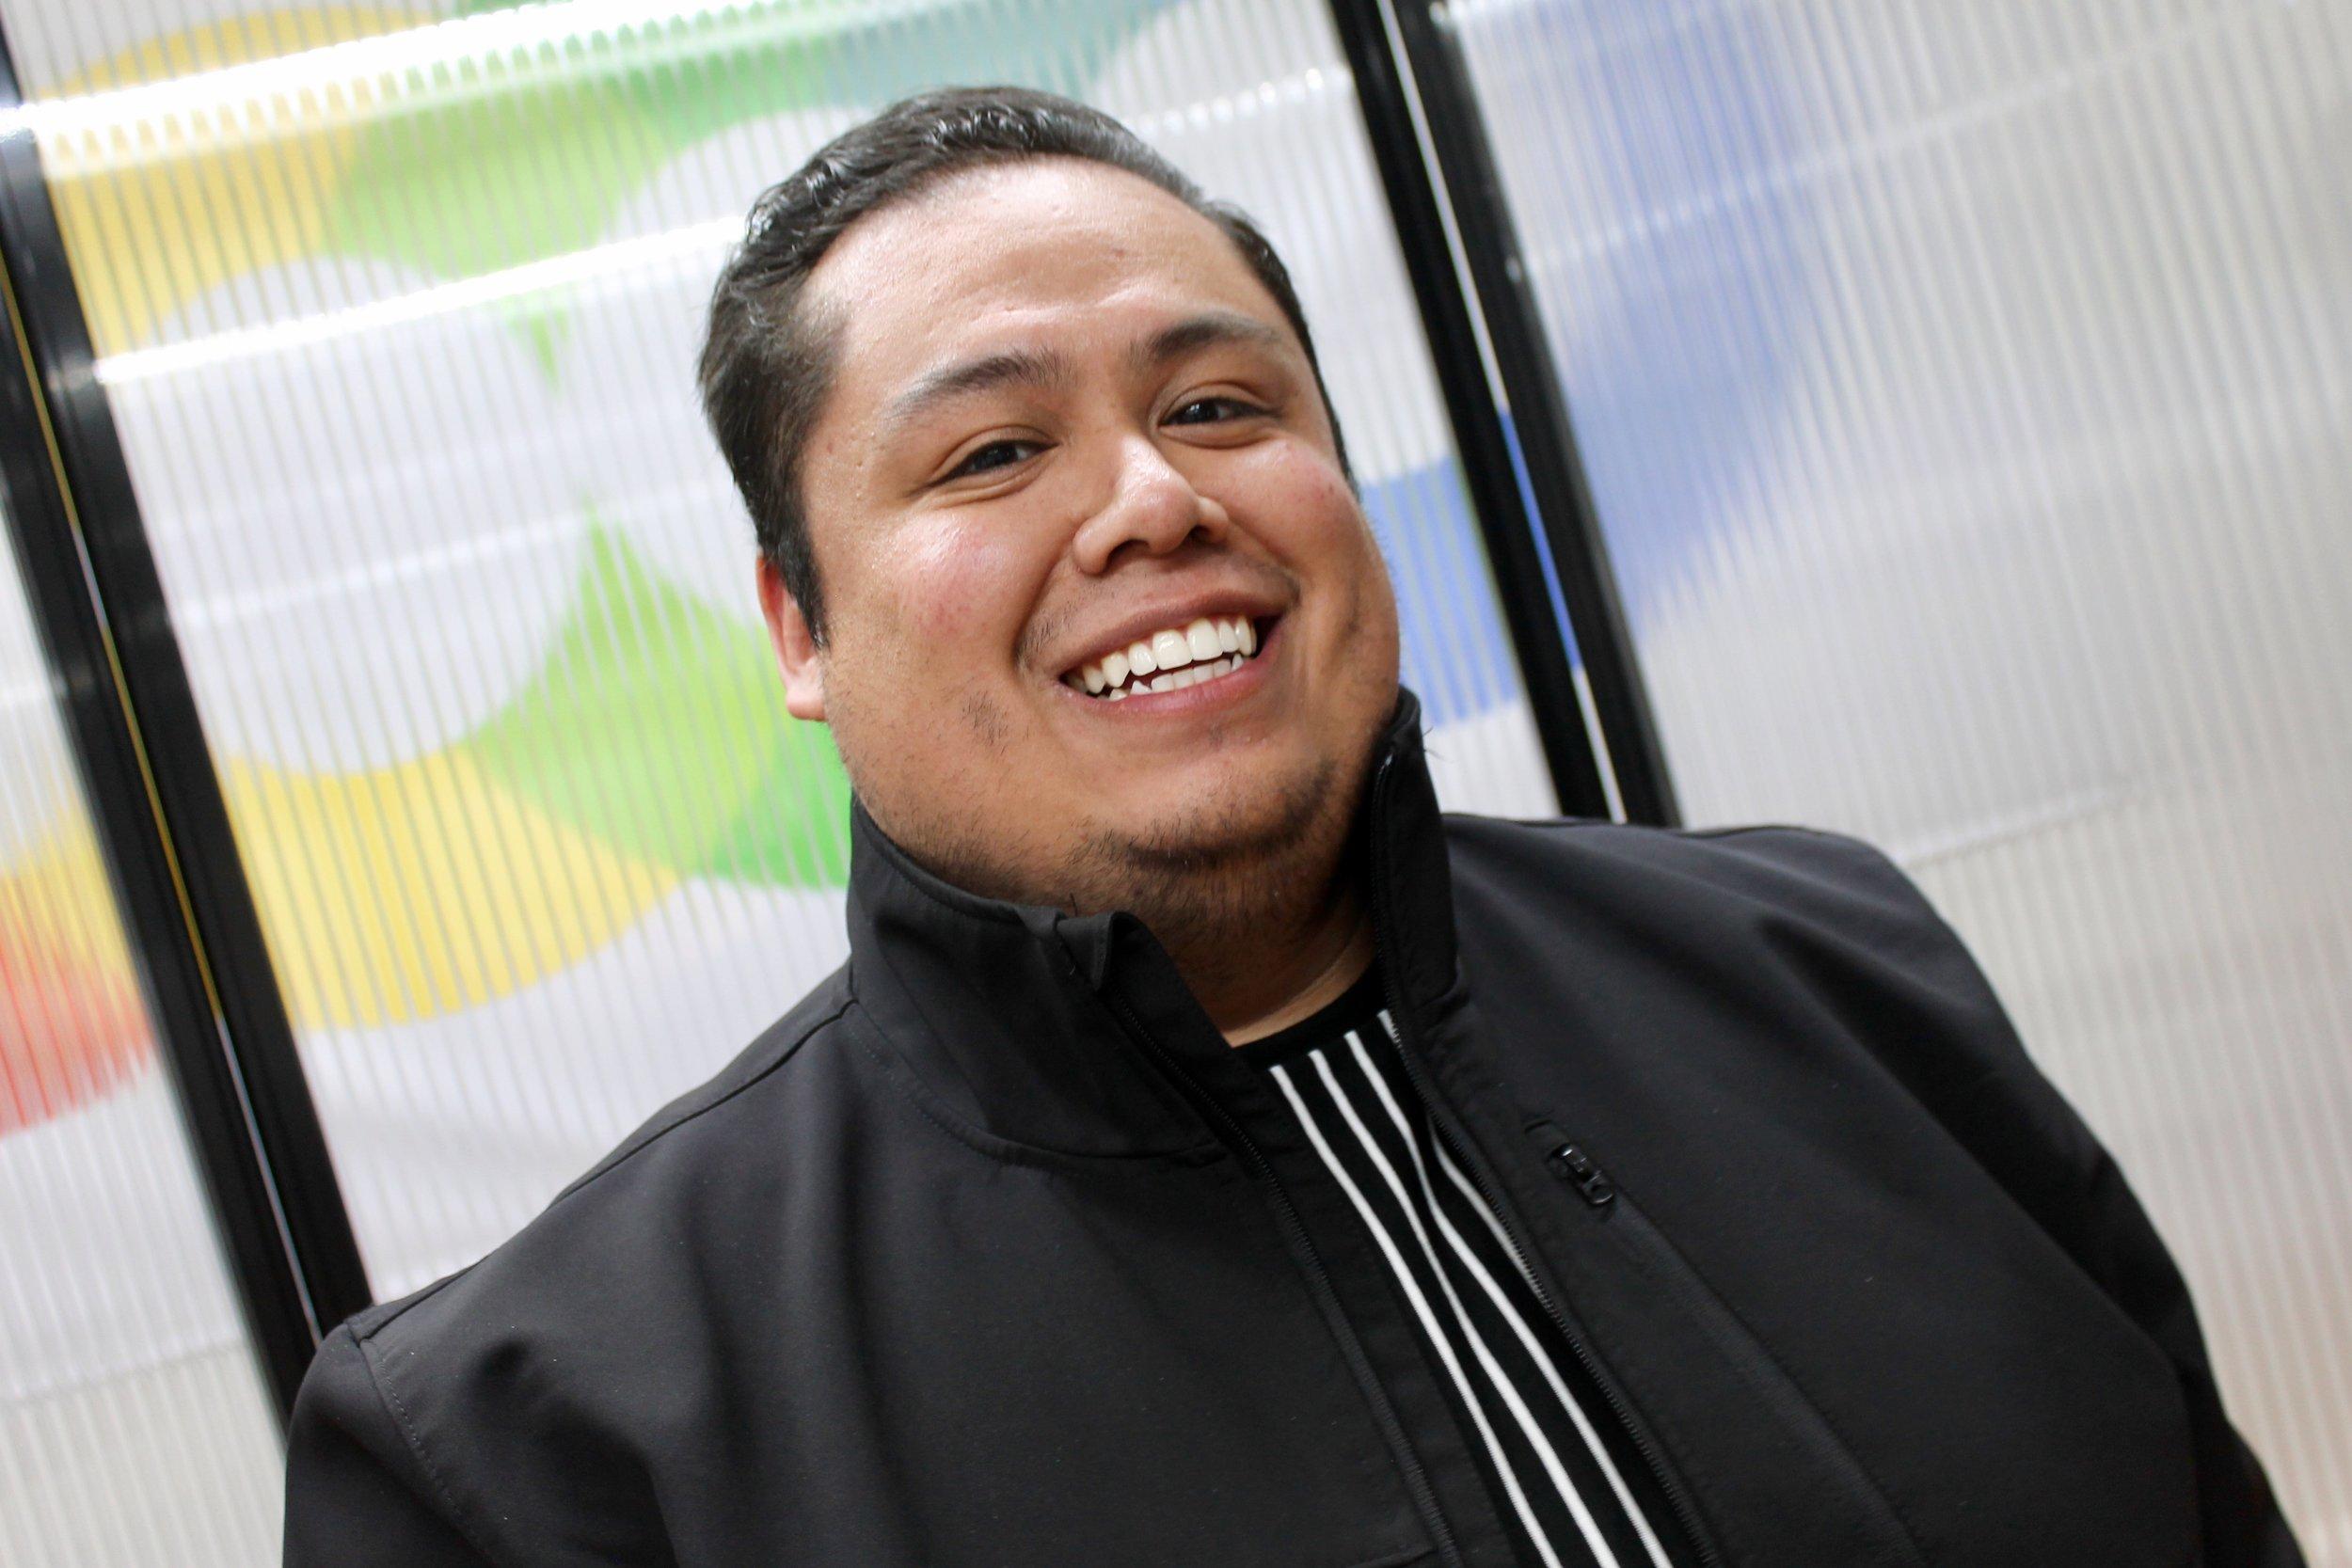 Omar Sanchez Diaz